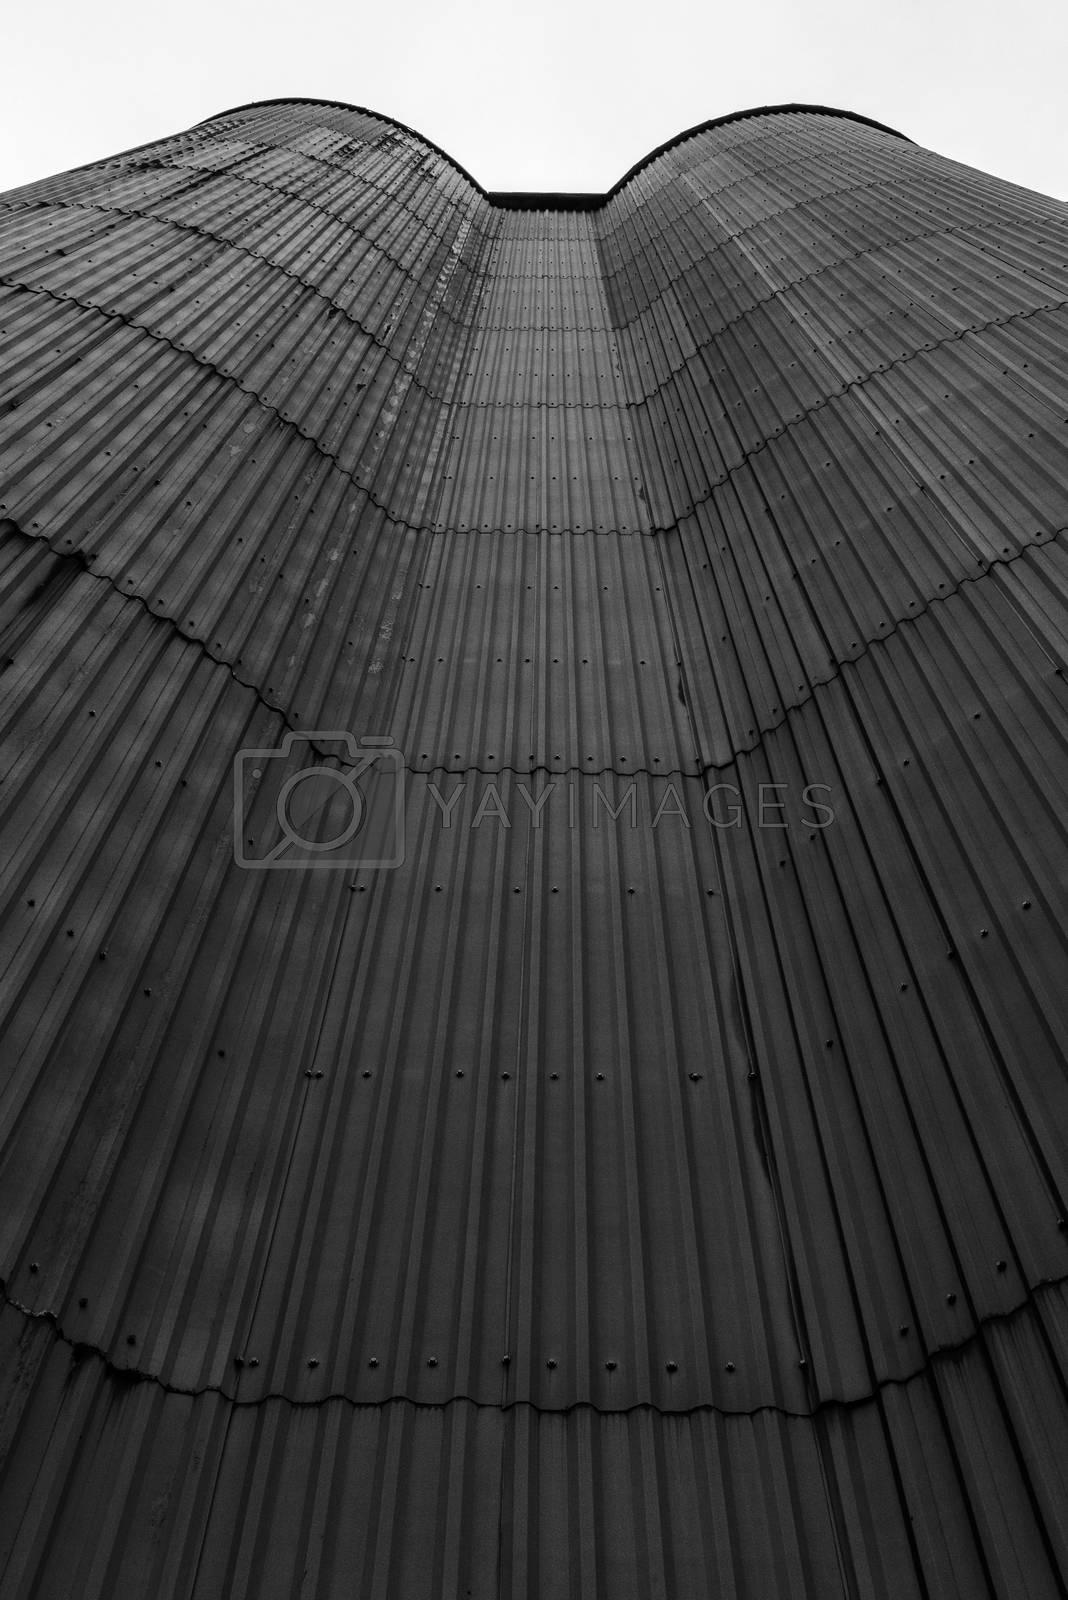 An old corrugated iron wall reaching towards the sky. by vidar.fredheim@dabb.no